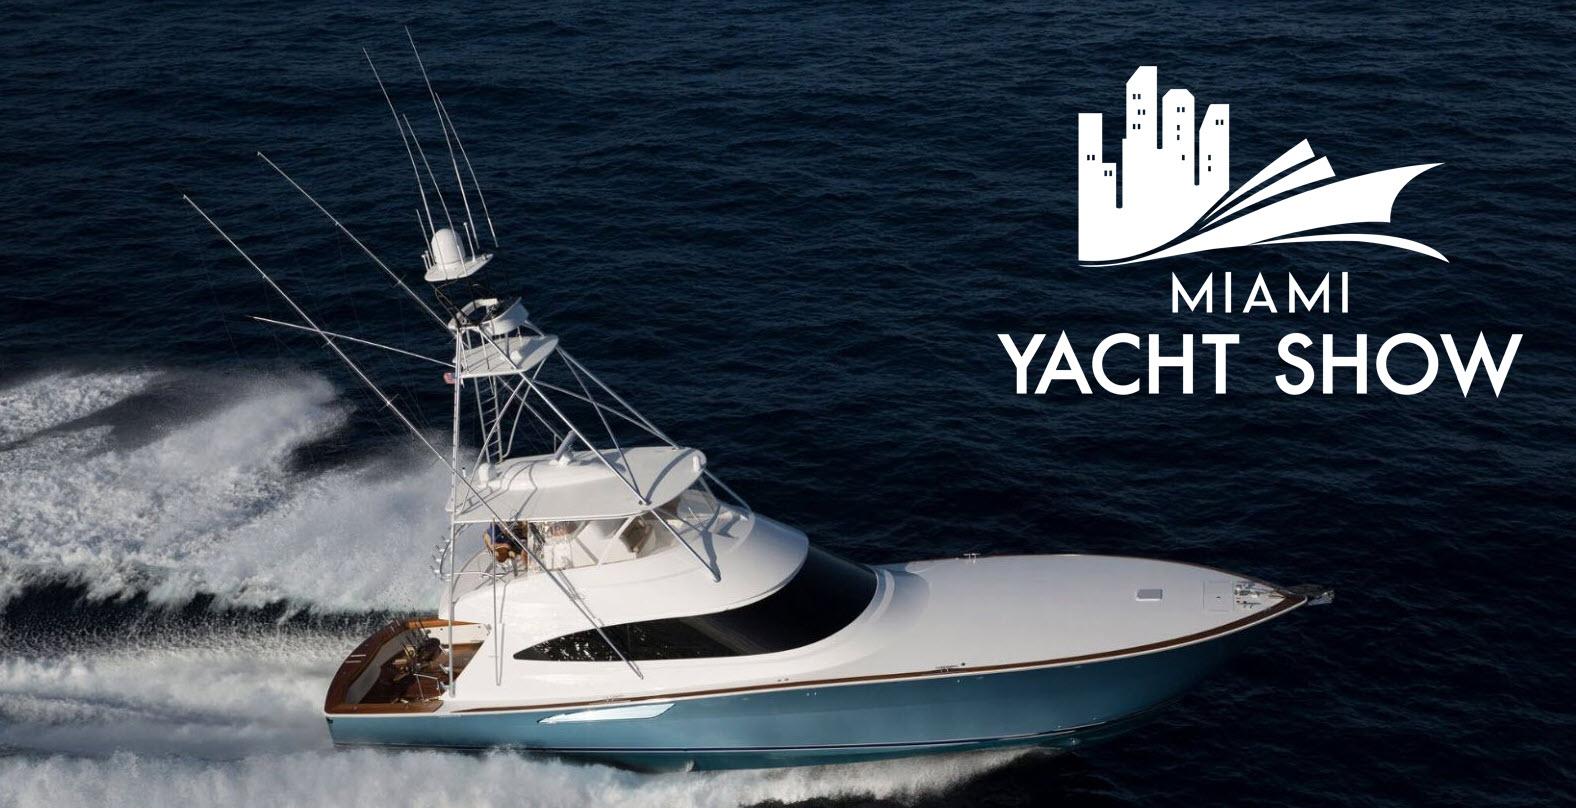 miami yacht show viking yachts